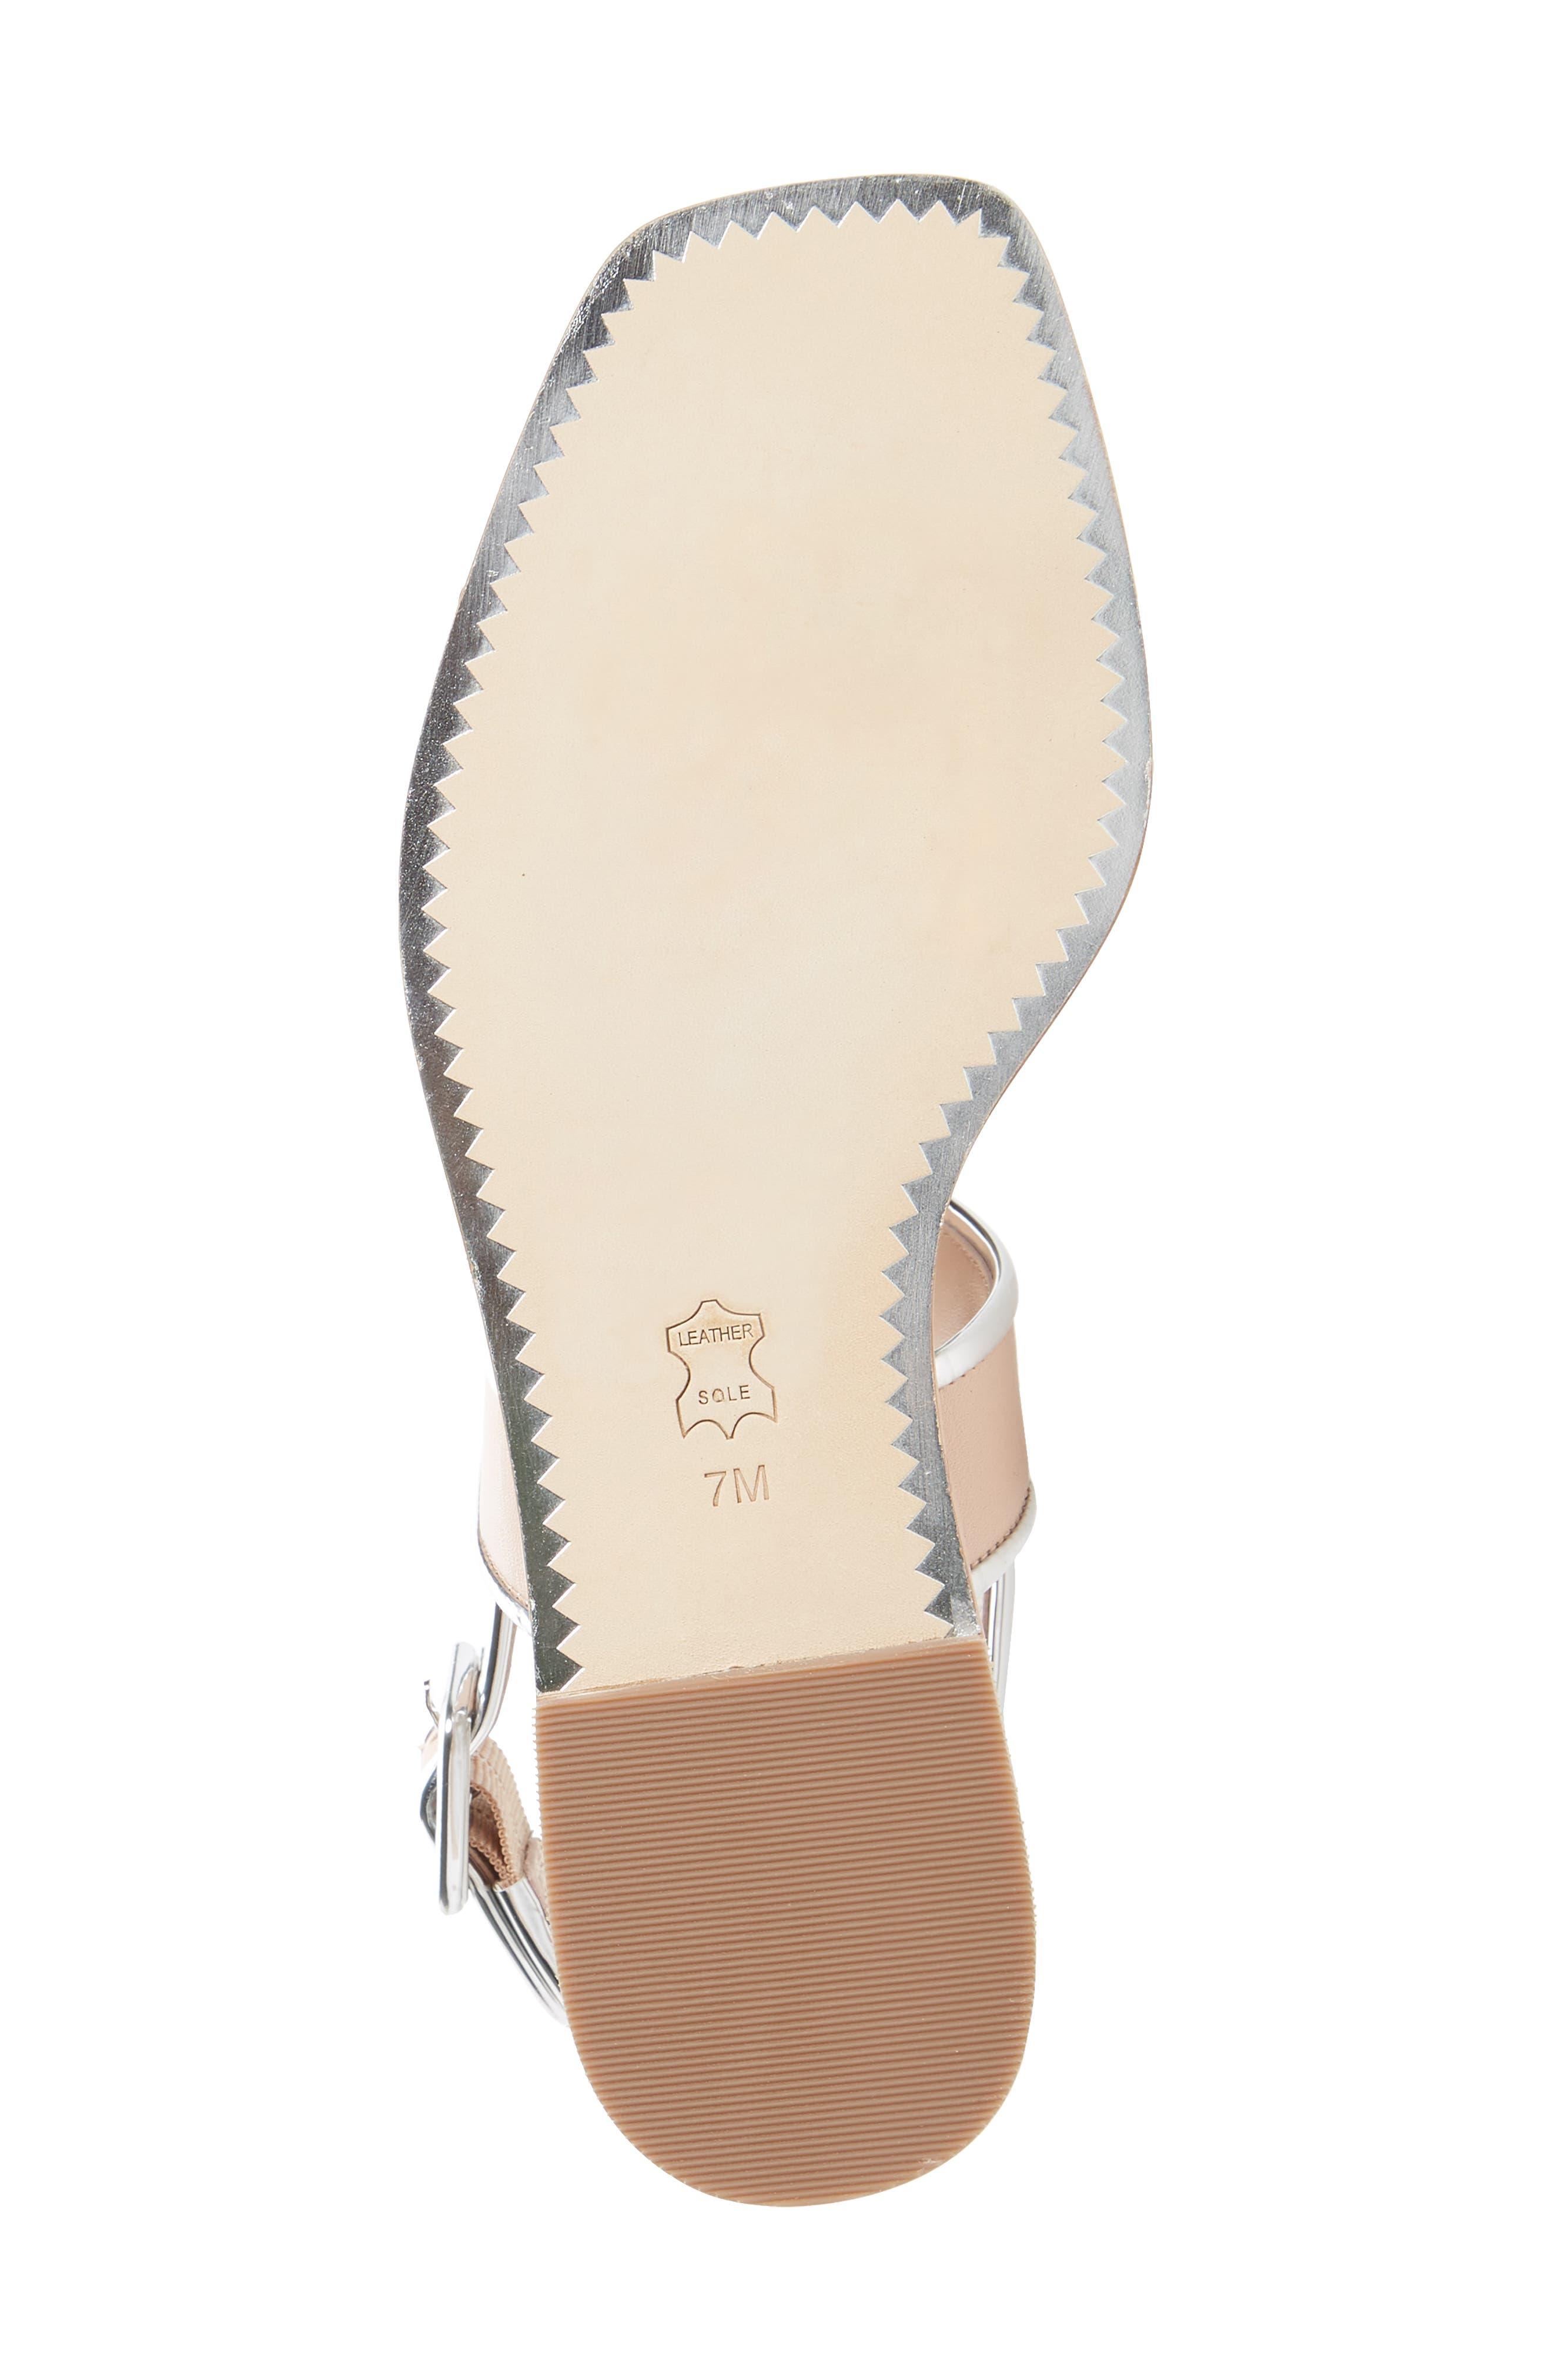 Delaney Double Strap Sandal,                             Alternate thumbnail 6, color,                             Goan Sand/ Silver